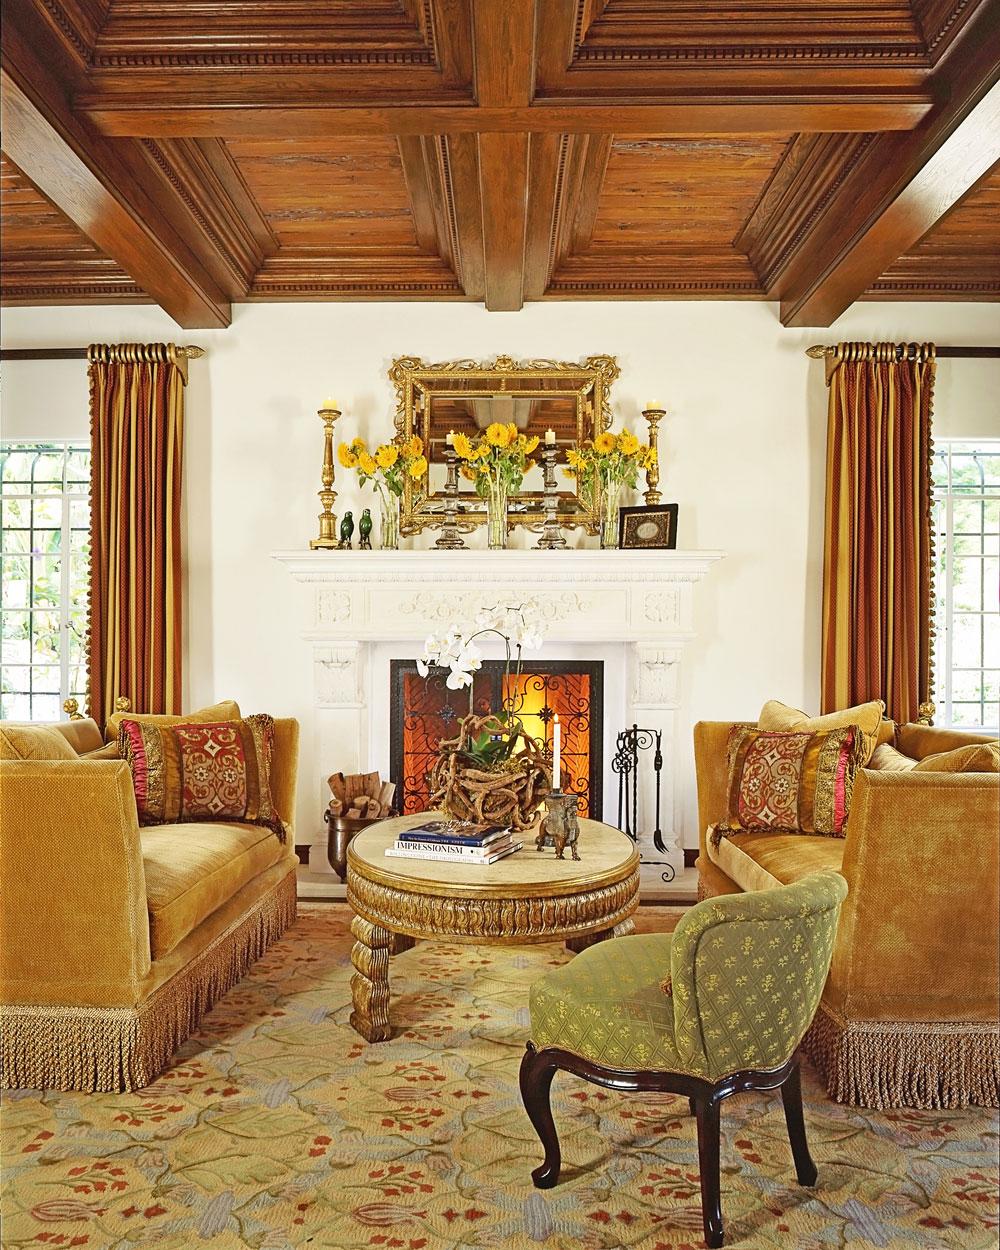 4-couch-living-room-fireplace-dee-carawan.jpg